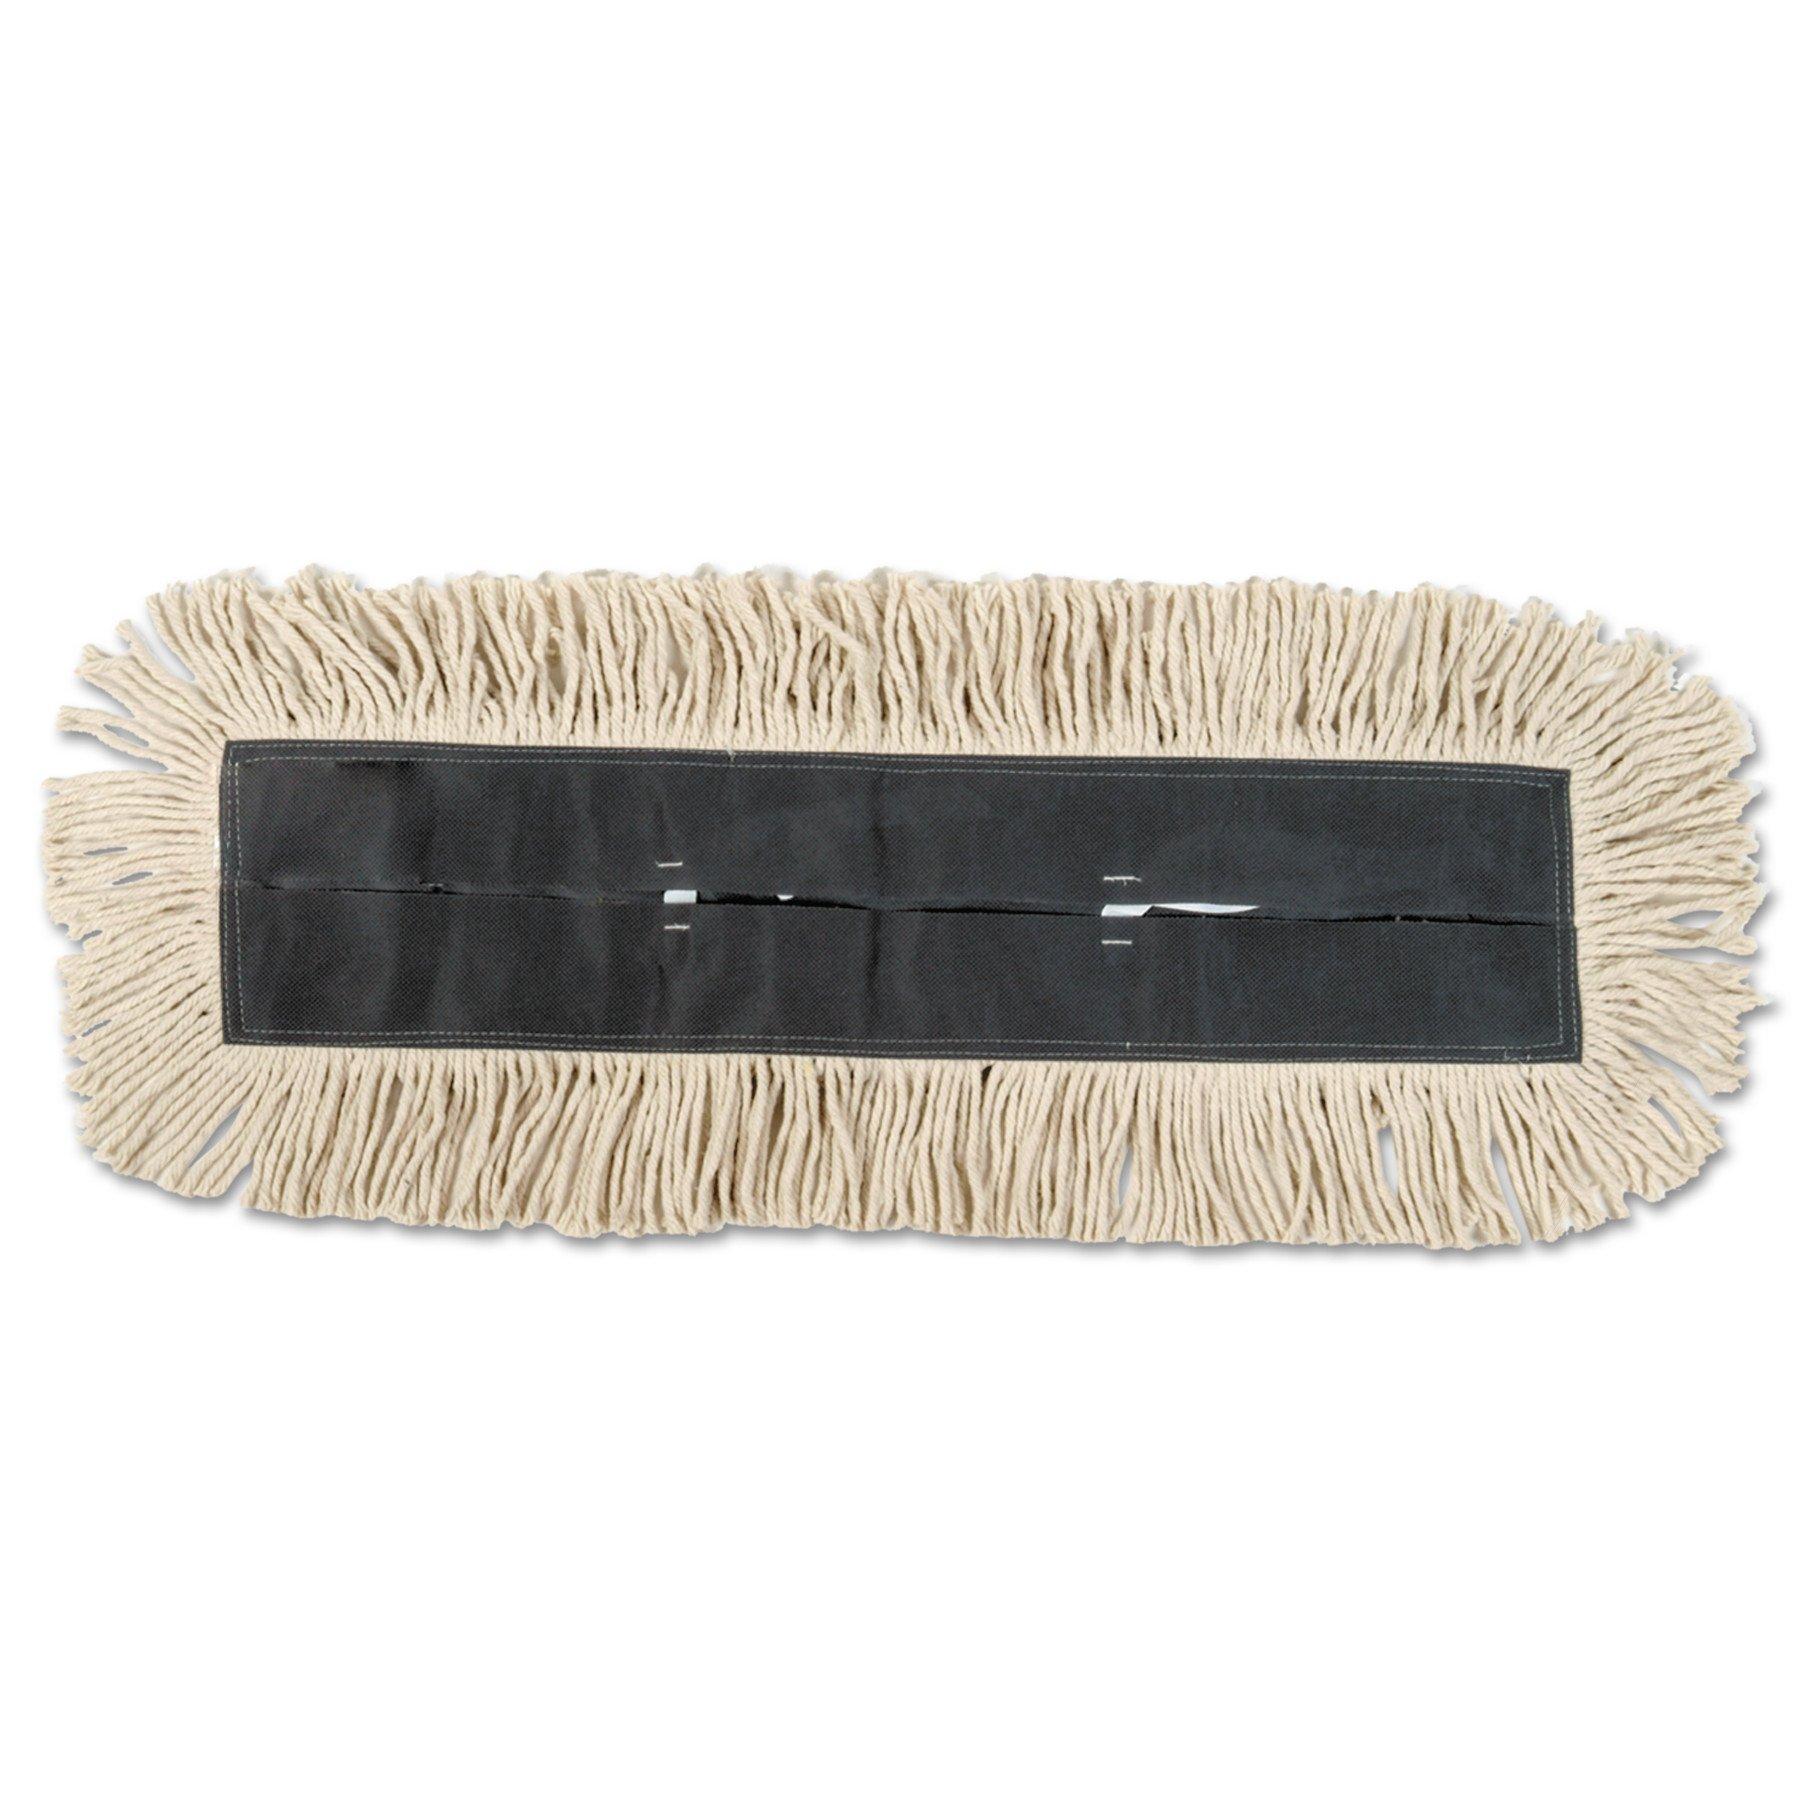 Boardwalk DD91536W 5 Inch x 36 Inch White Disposable Dust Mop (Case of 6)